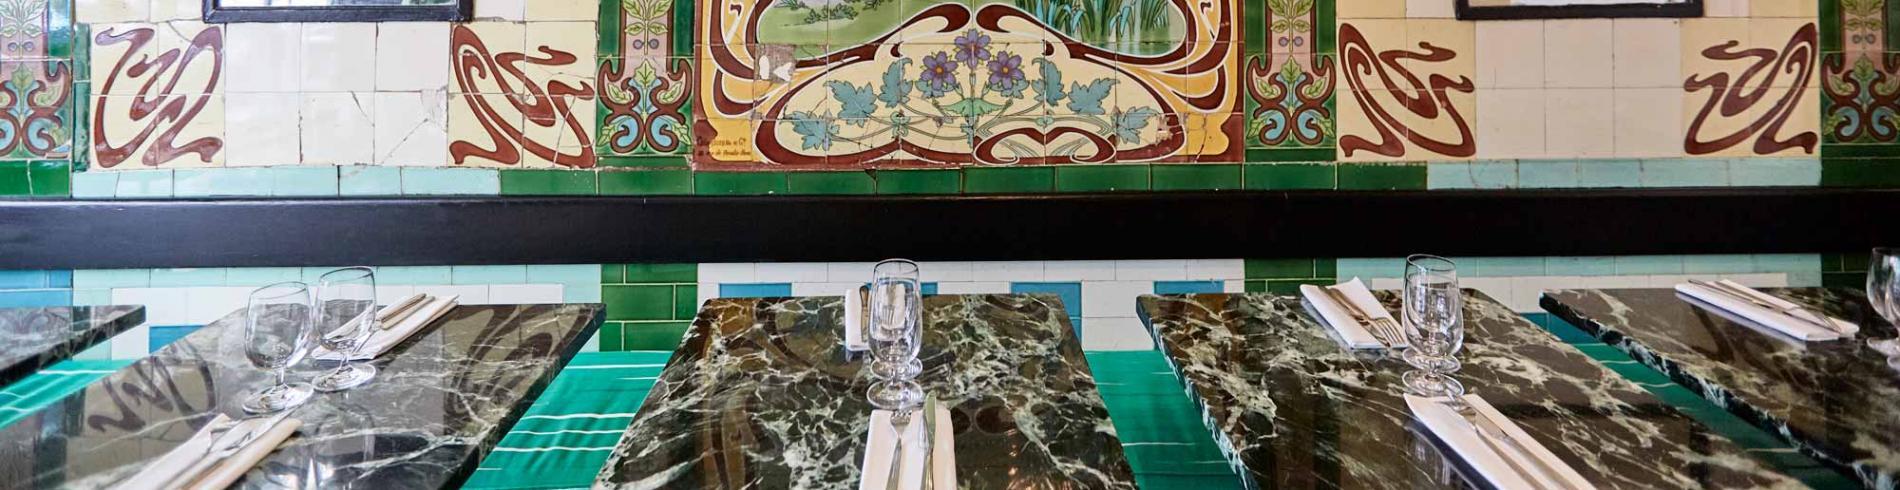 The luxurious decor at Restaurant Da Graziella